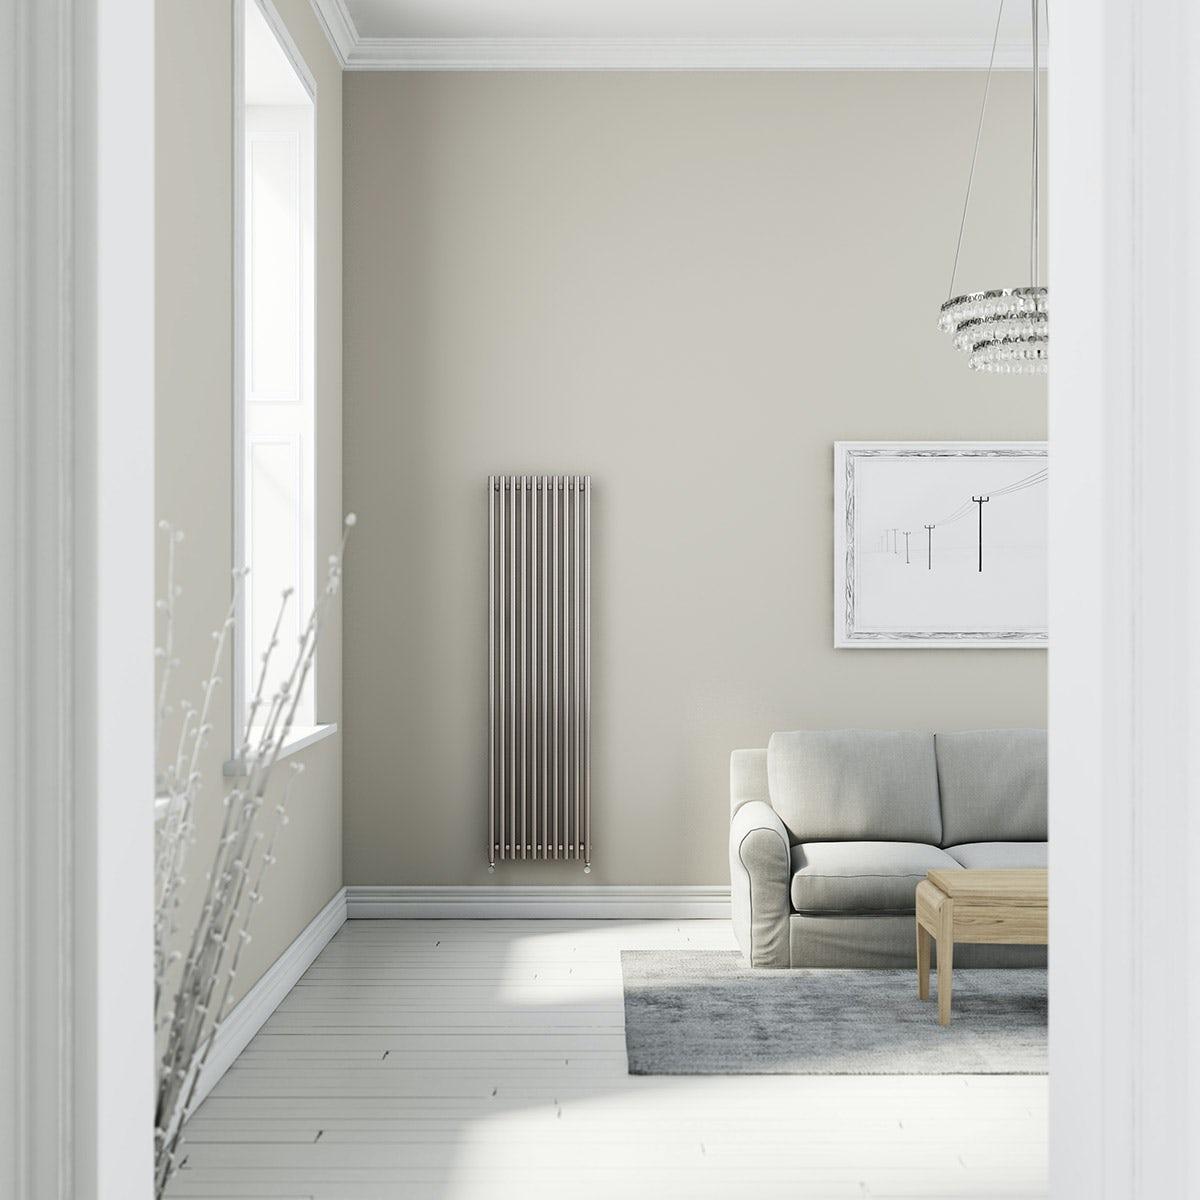 Terma Tune matt nickel single vertical radiator 1800 x 490